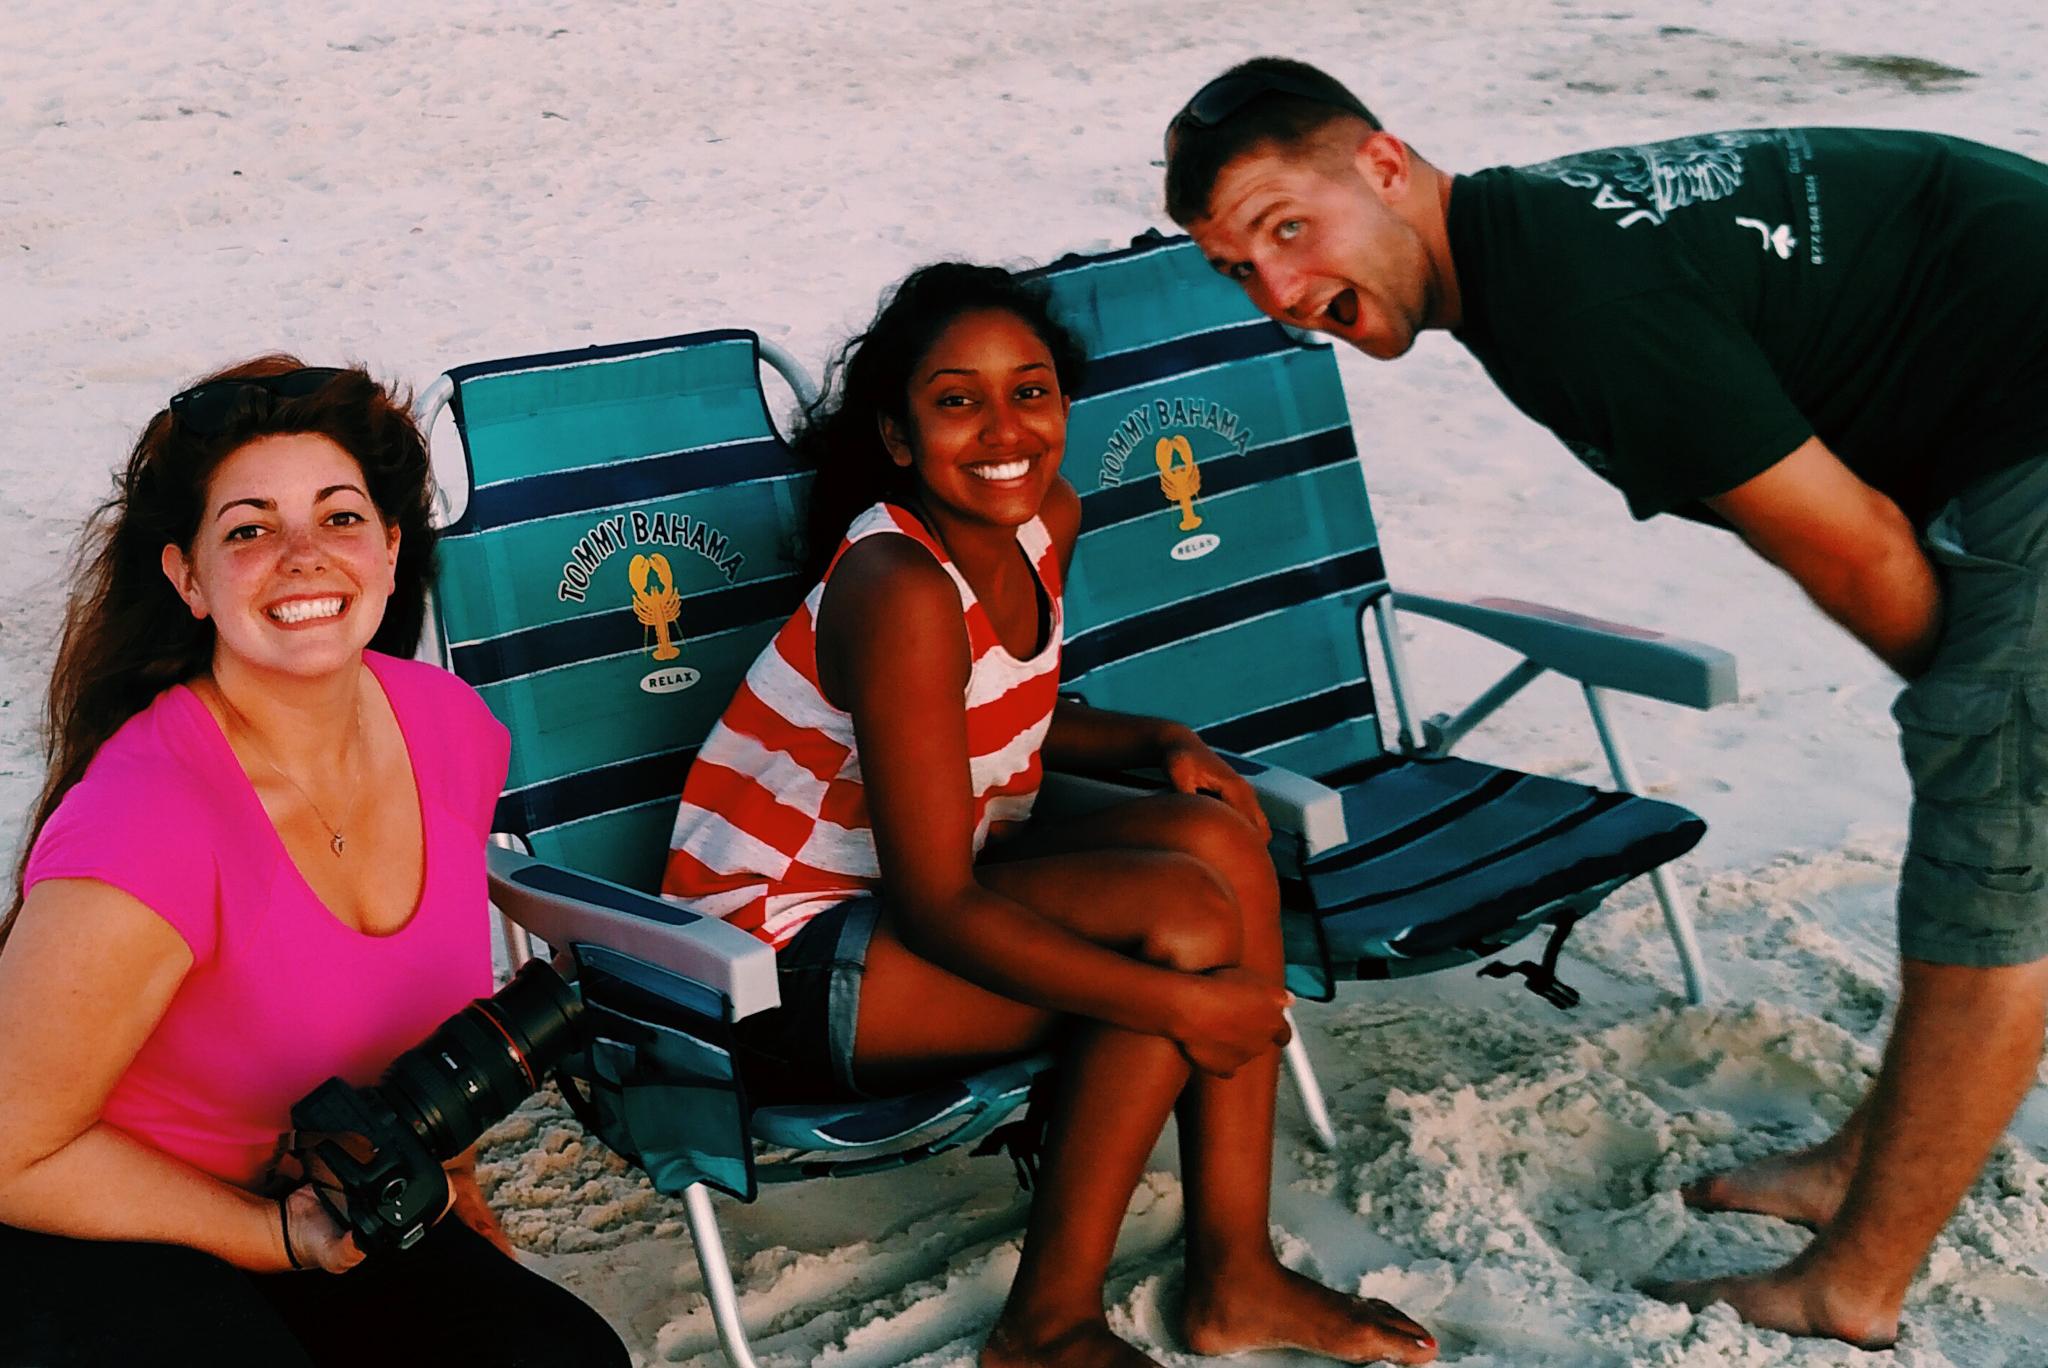 samburkardt_engagement_vacation_beach_cape_san_blas_florida_camping_gopro_0033.jpg